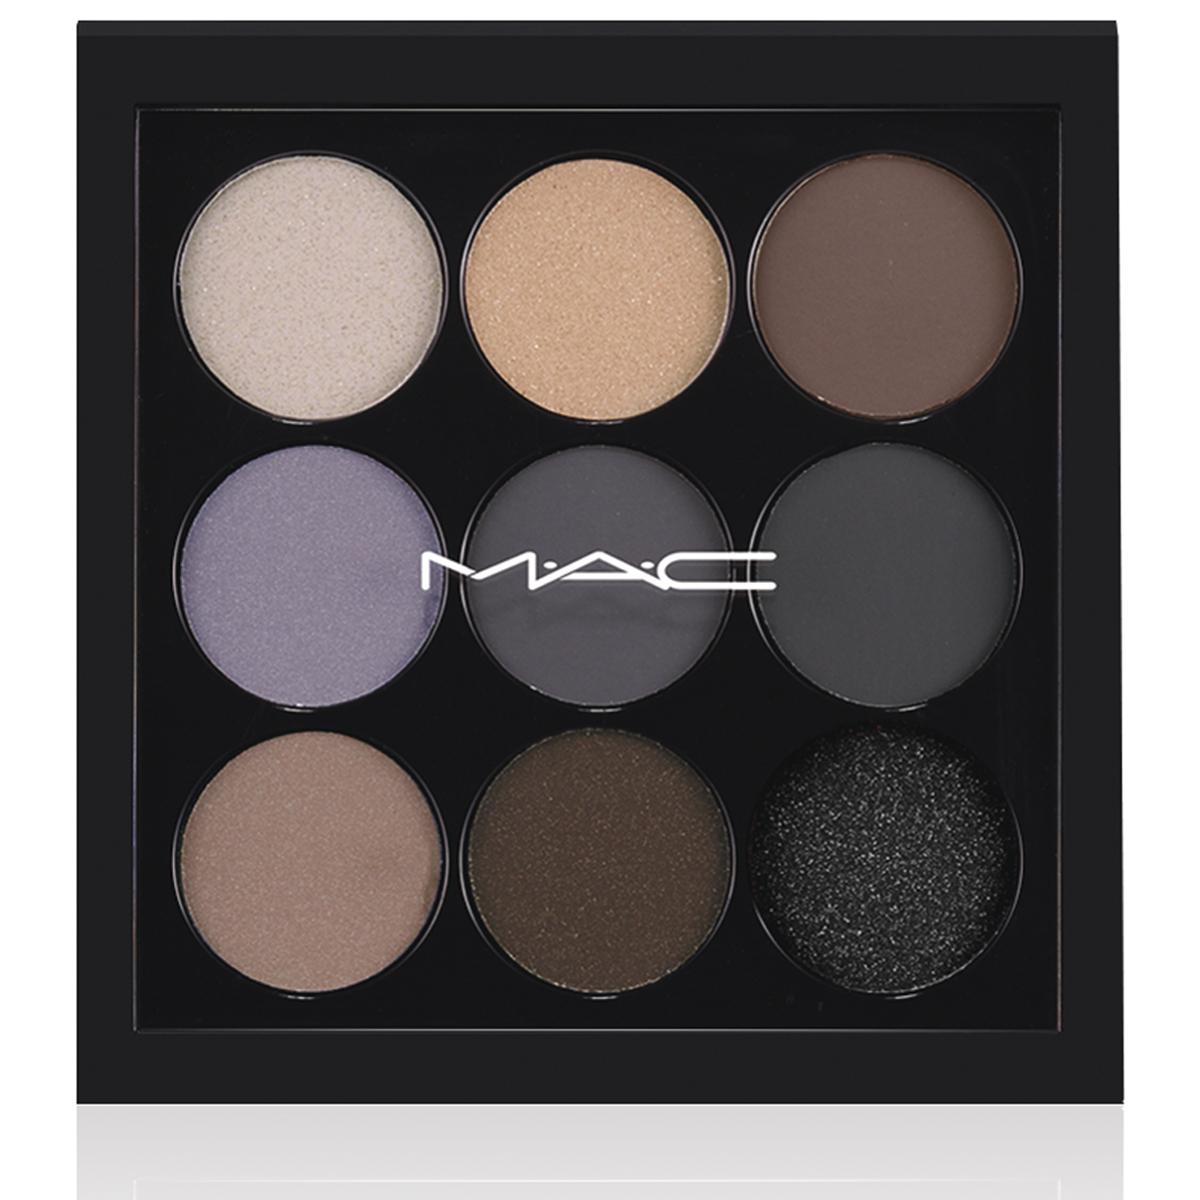 EYES ON MAC Navy Times Nine x 9 Eyeshadow Palette